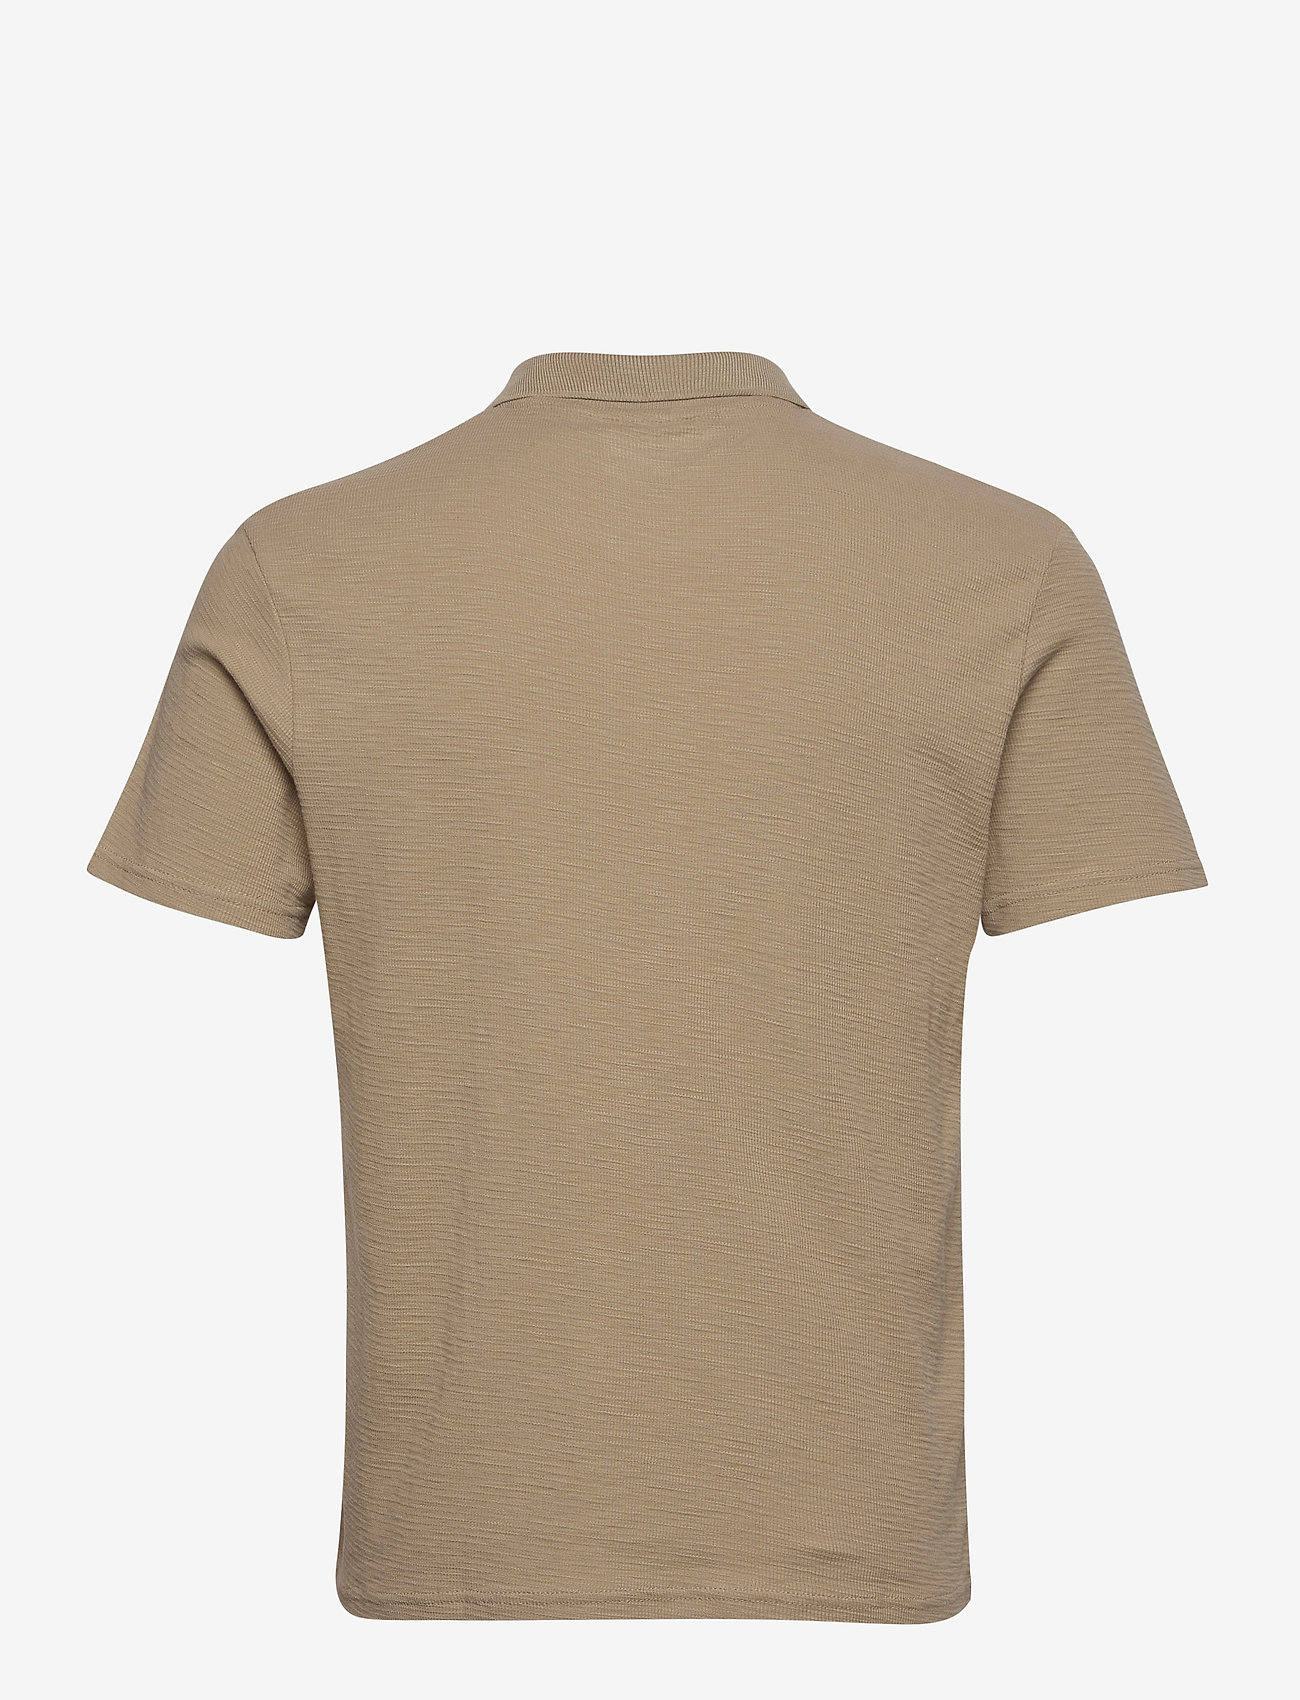 Jack & Jones - JORERIC POLO SS BLK - short-sleeved polos - crockery - 1